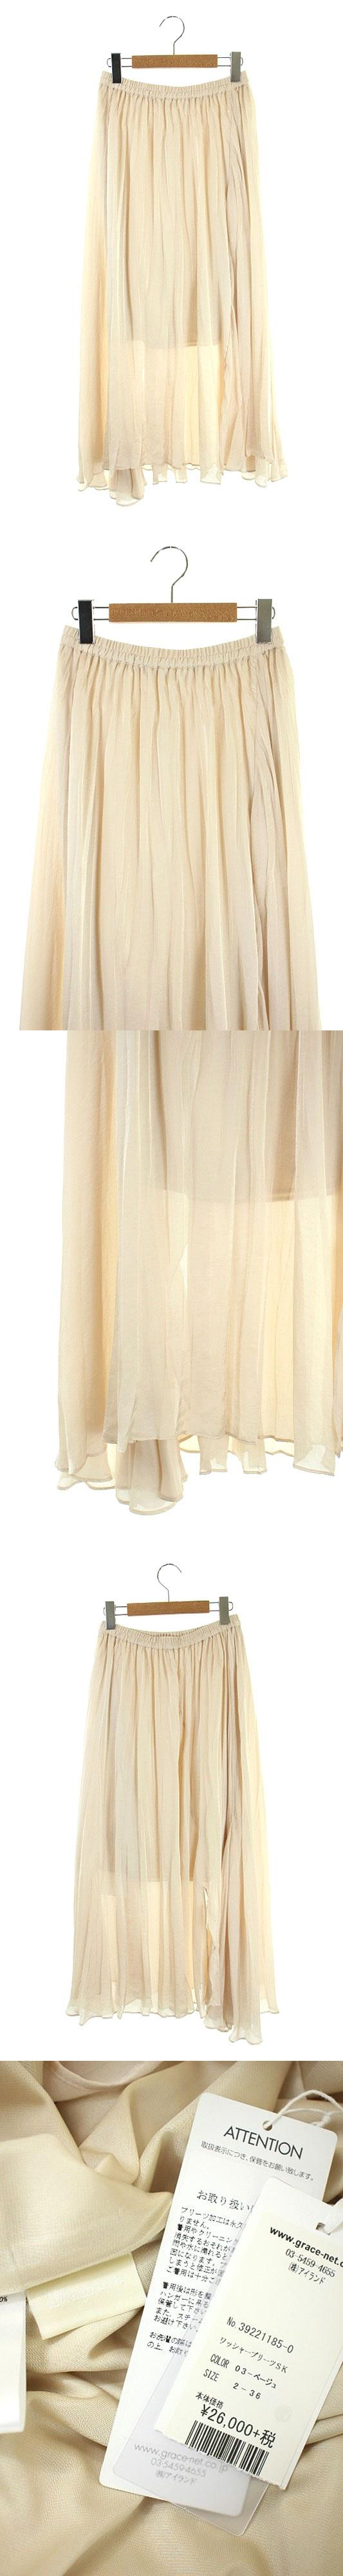 19SS スカート プリーツ フレア マキシ丈 36 ベージュ /KN ■OS